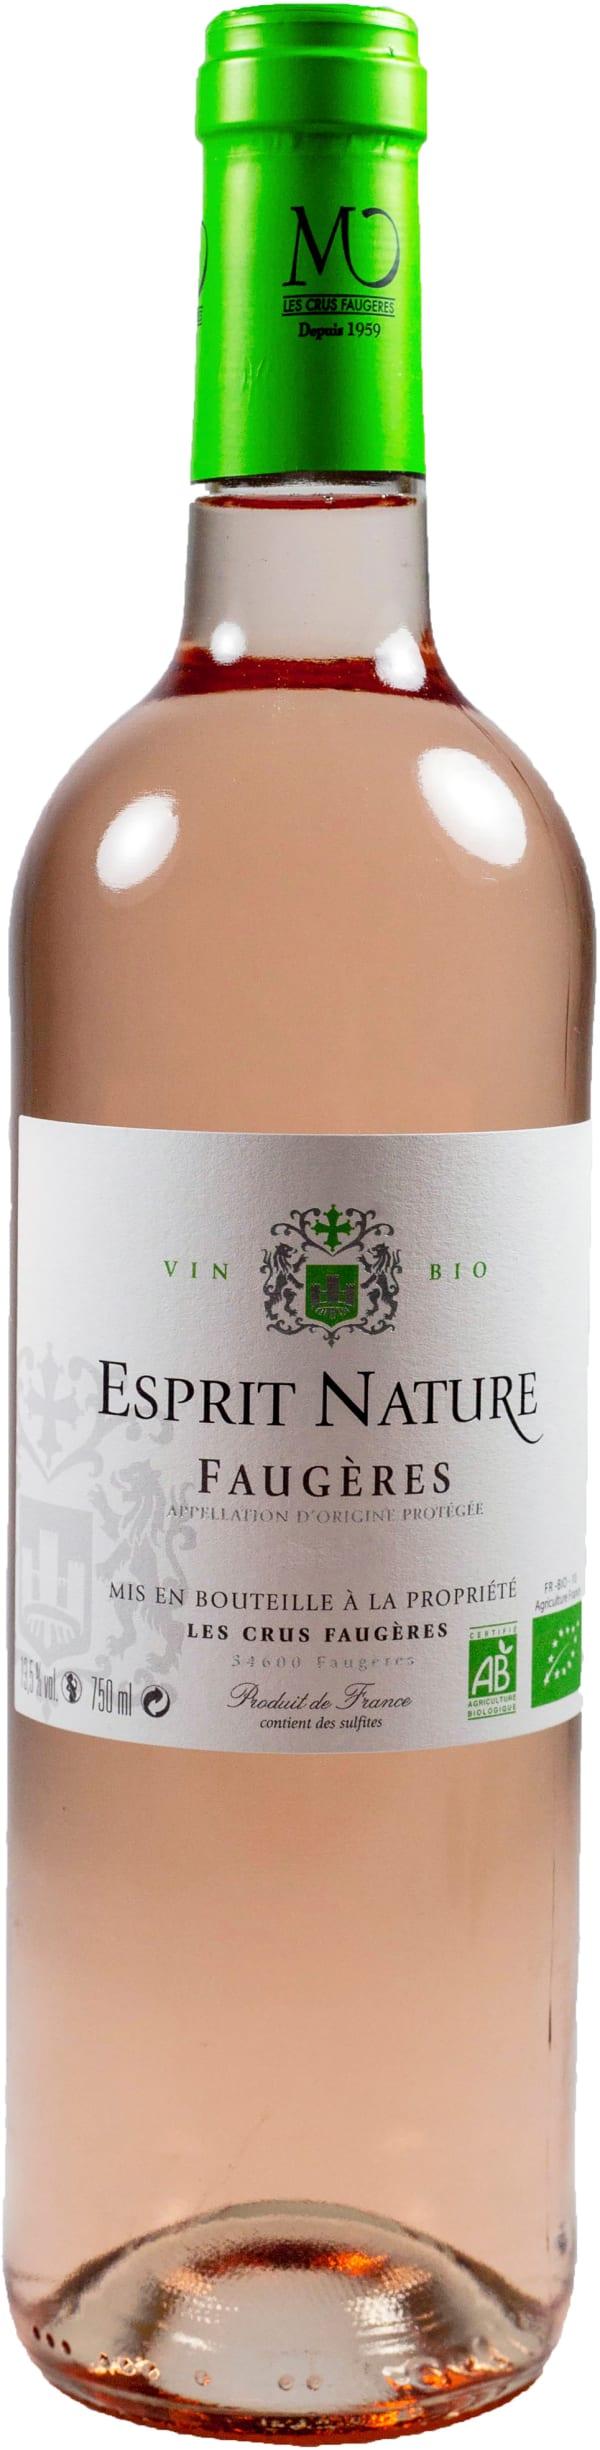 Les Crus Faugeres Esprit Nature Bio Rosé 2017